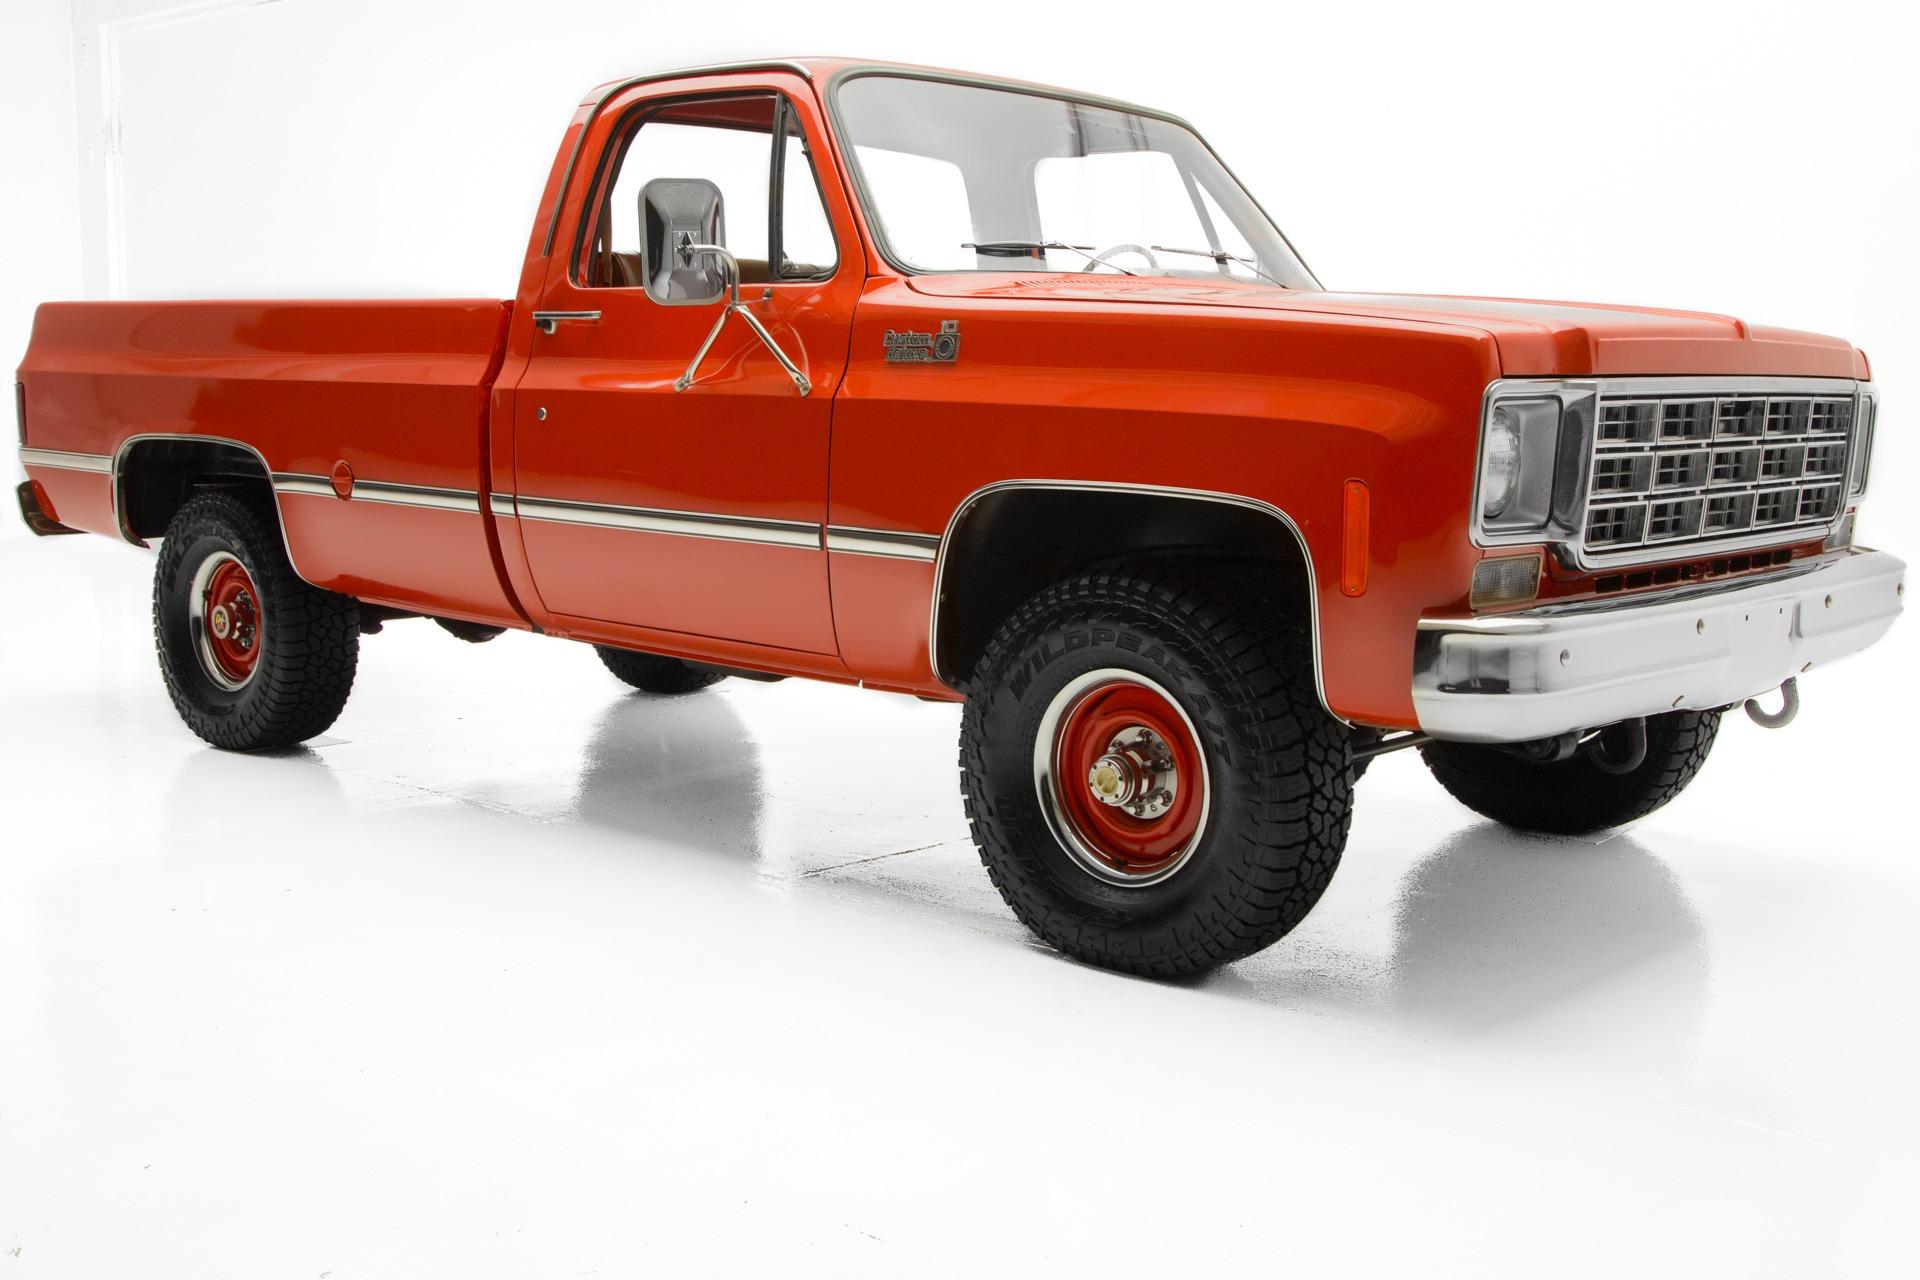 1977 chevrolet custom big red k10 4x4 4 spd american dream rh admcars com 1986 Chevrolet manual chevrolet c10 1977